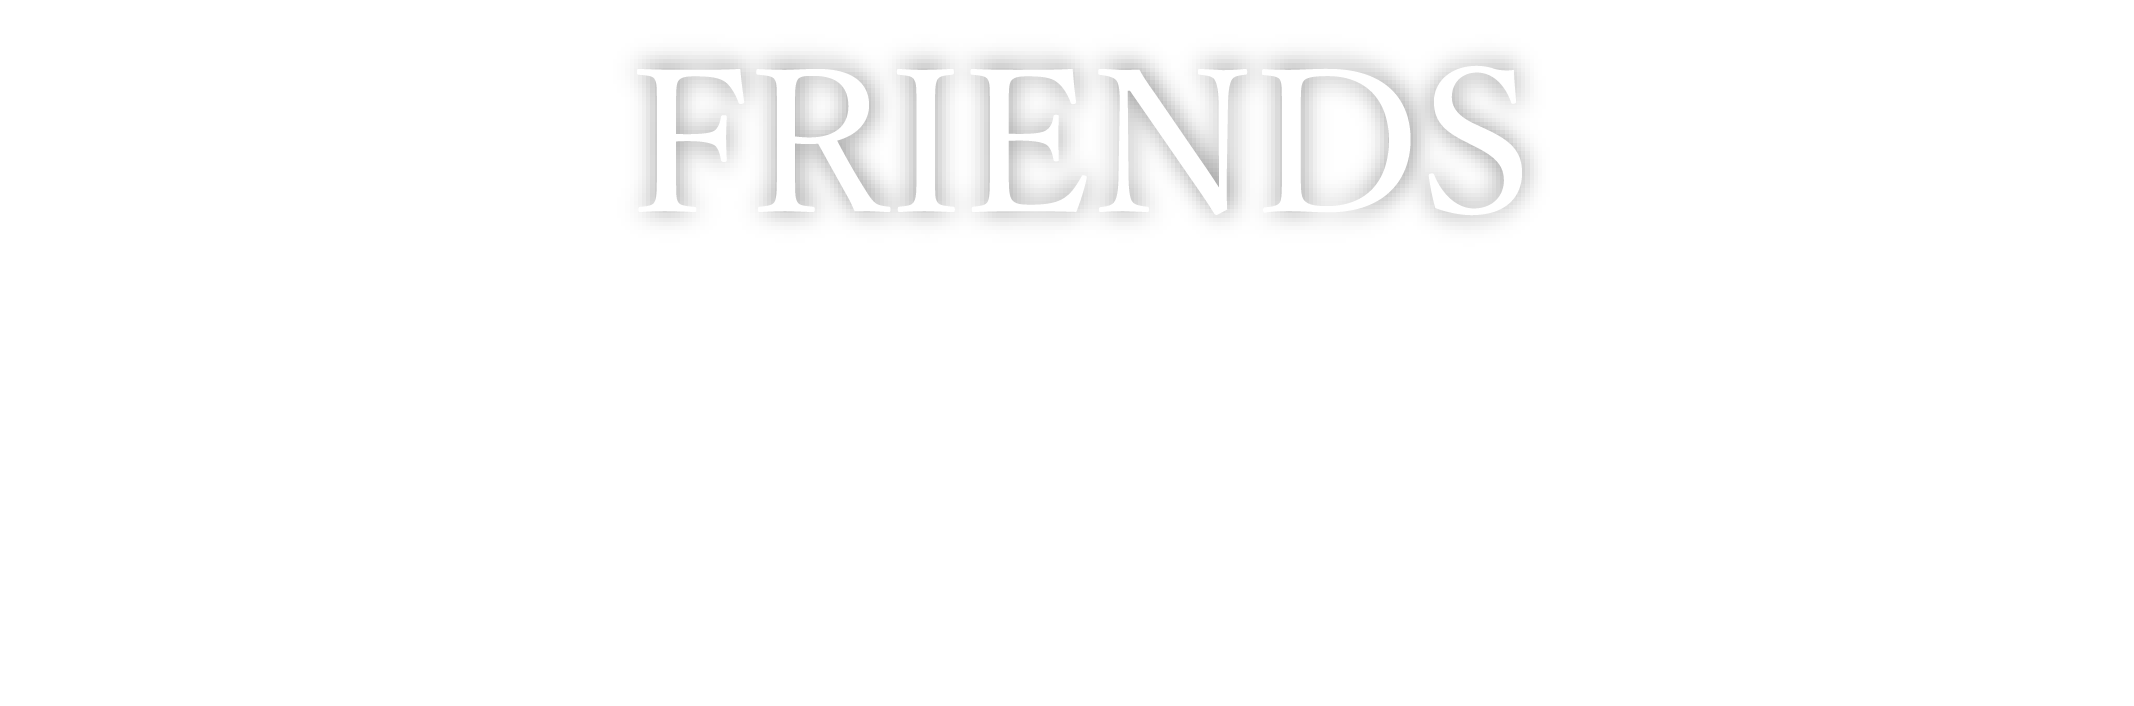 FRIENDS-フレンズ-